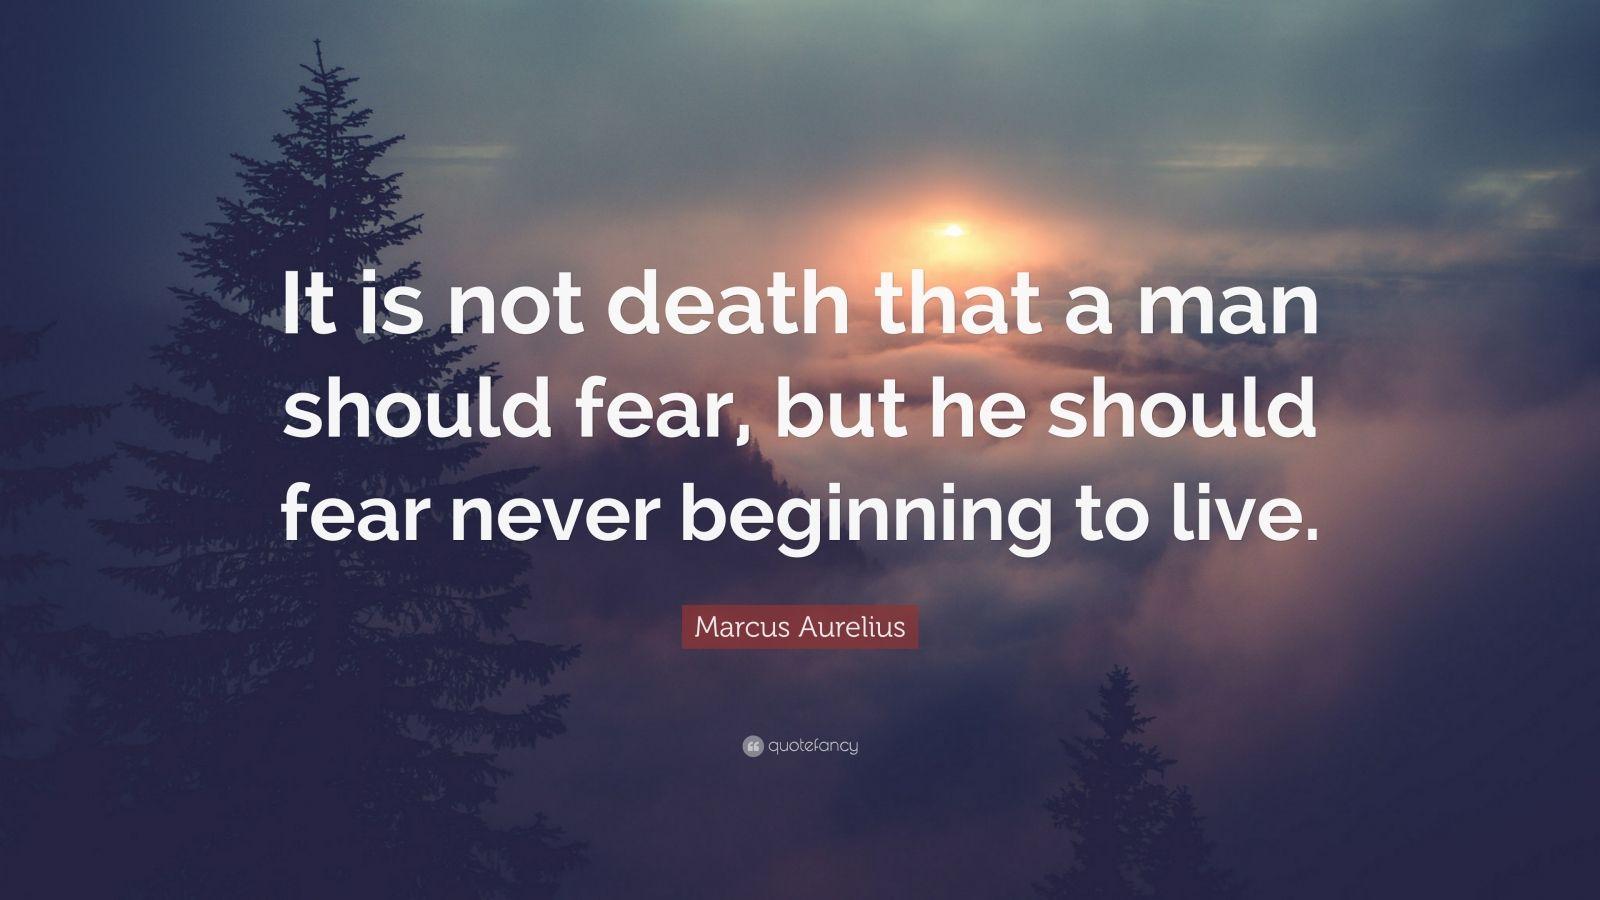 Dalai Lama Wallpaper Quotes Marcus Aurelius Quote It Is Not Death That A Man Should